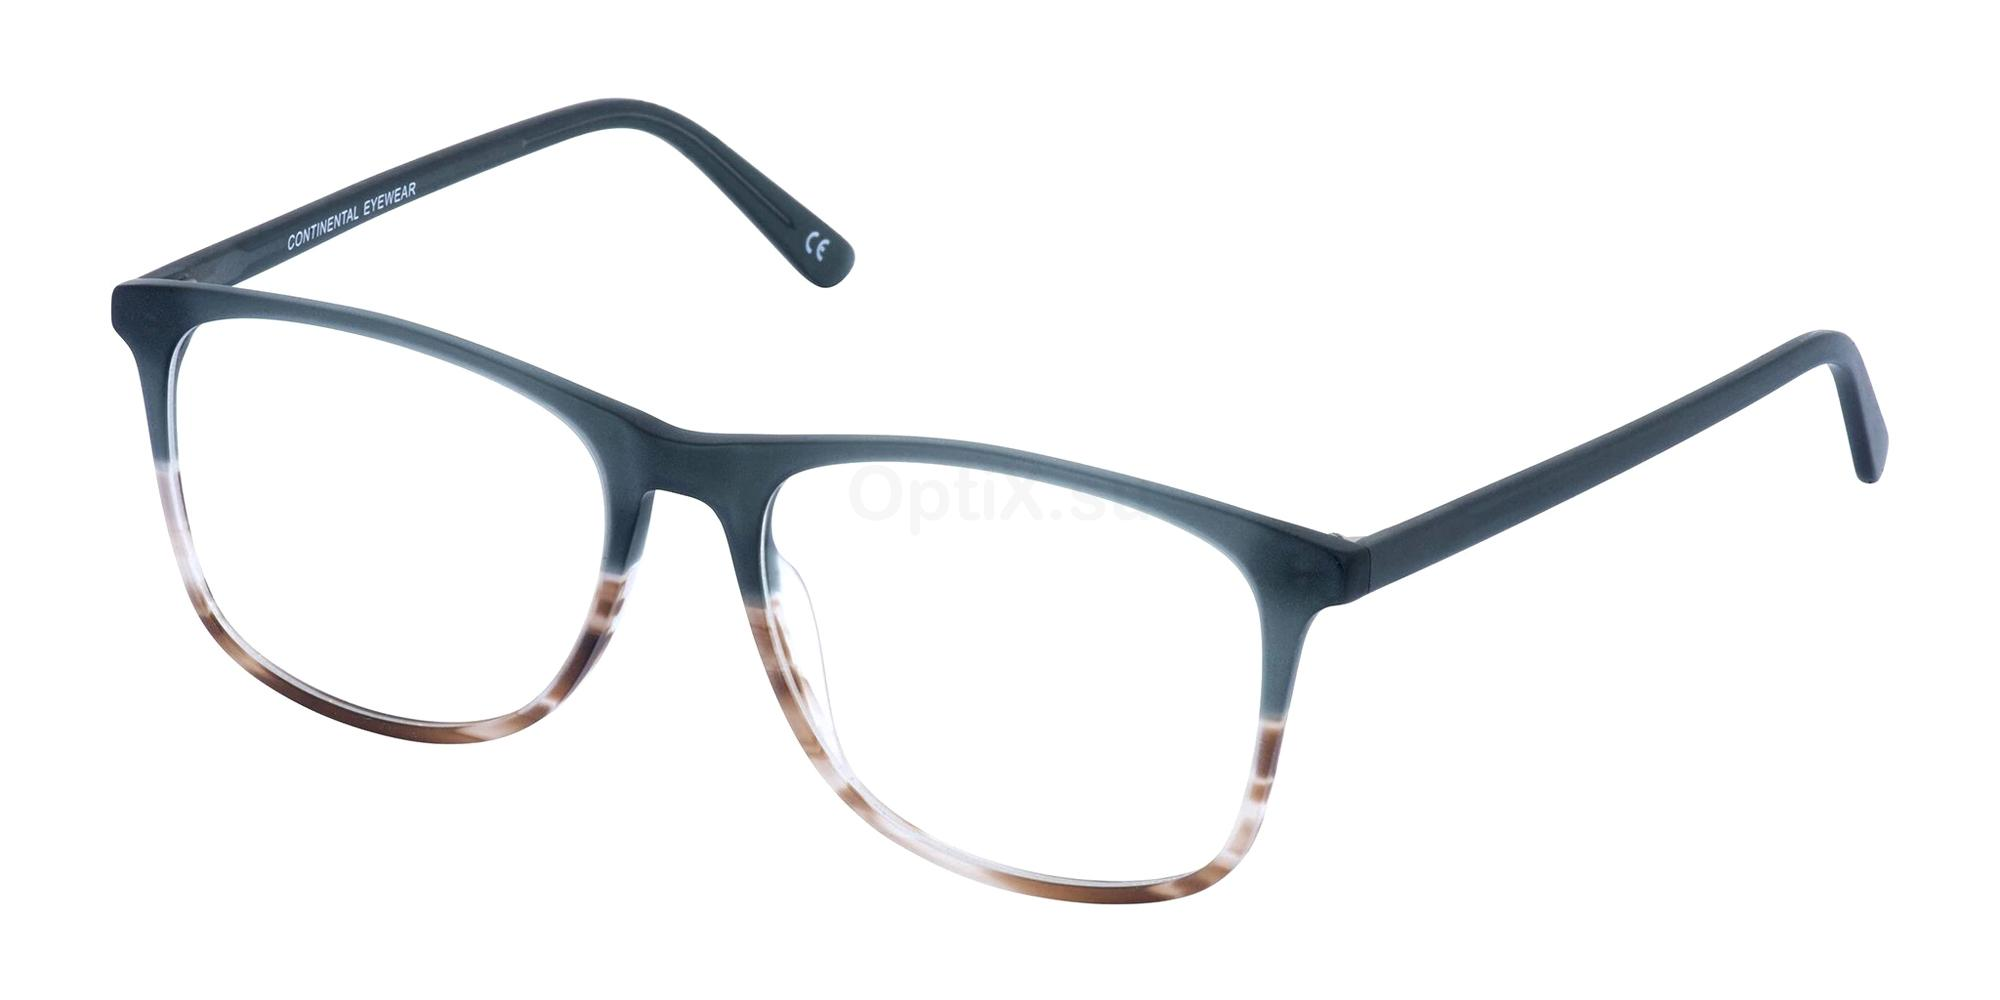 Olive ROBERT Glasses, Cameo